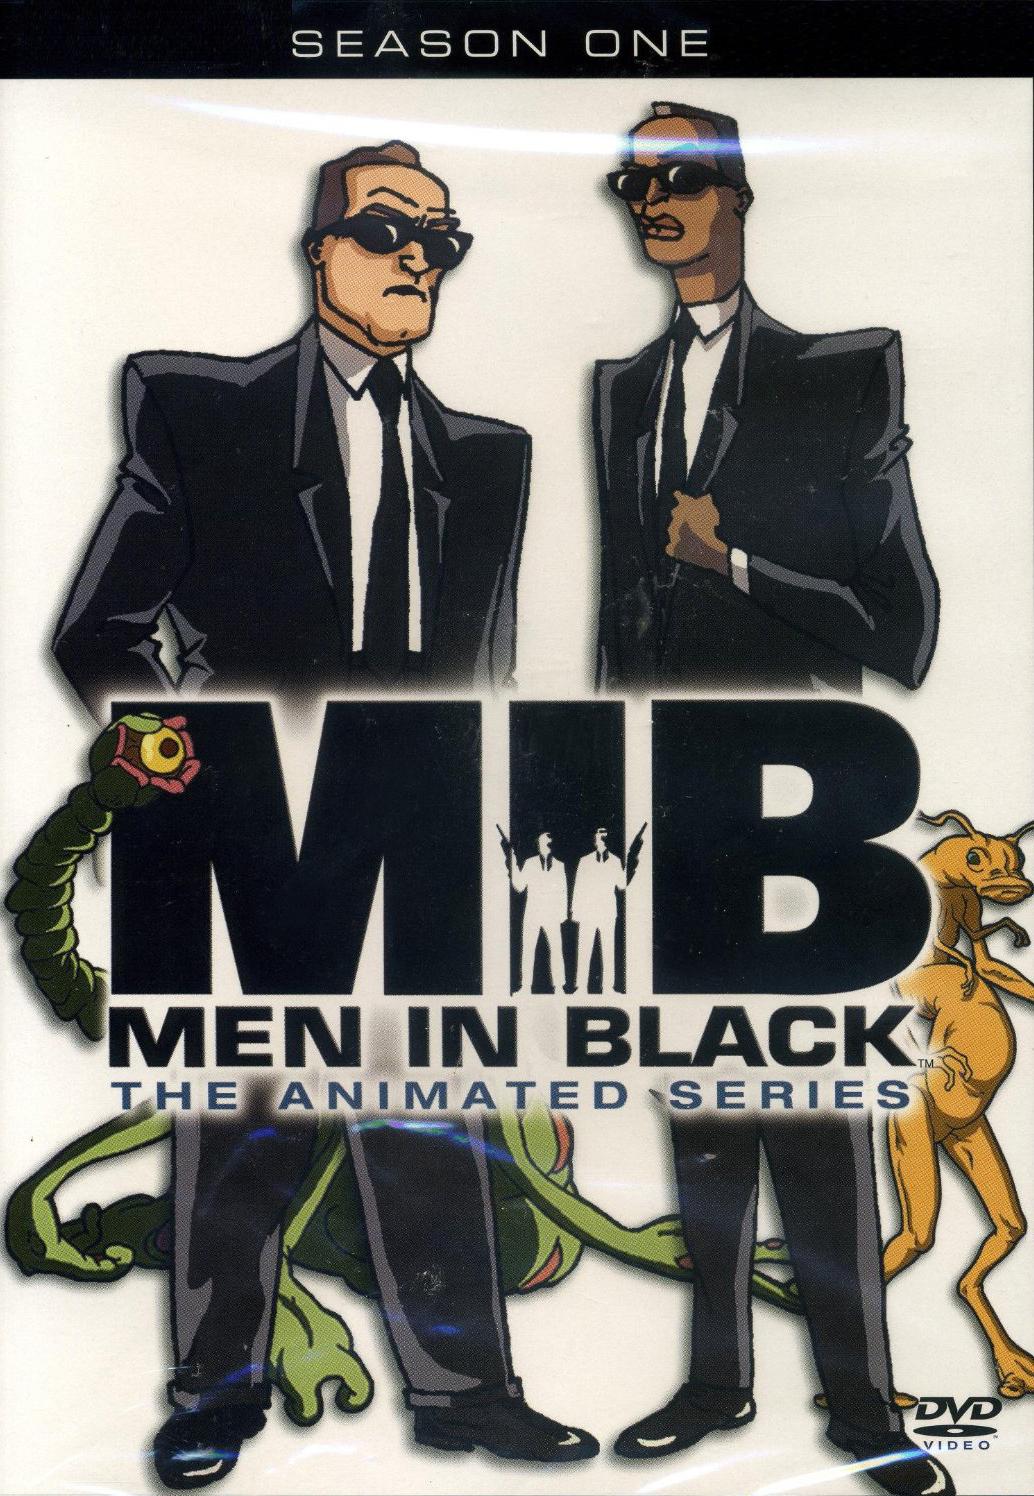 Men in Black: The Series (1997)